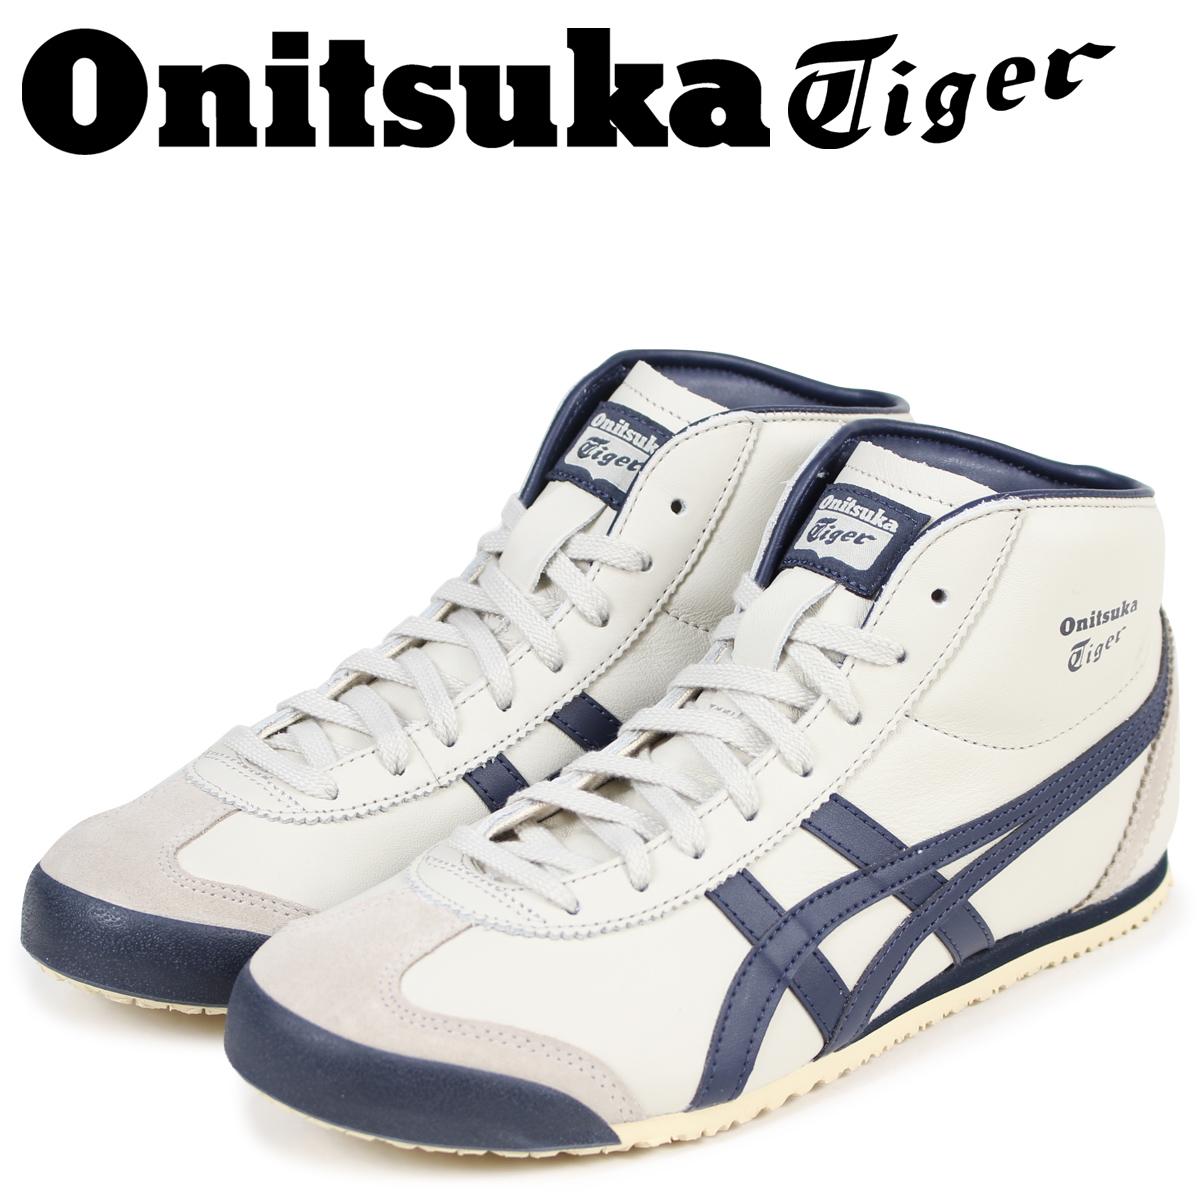 Onitsuka Tiger メキシコ ミッド ランナー オニツカタイガー MEXICO MID RUNNER メンズ スニーカー DL328-1659 THL328-1659 ホワイト 白